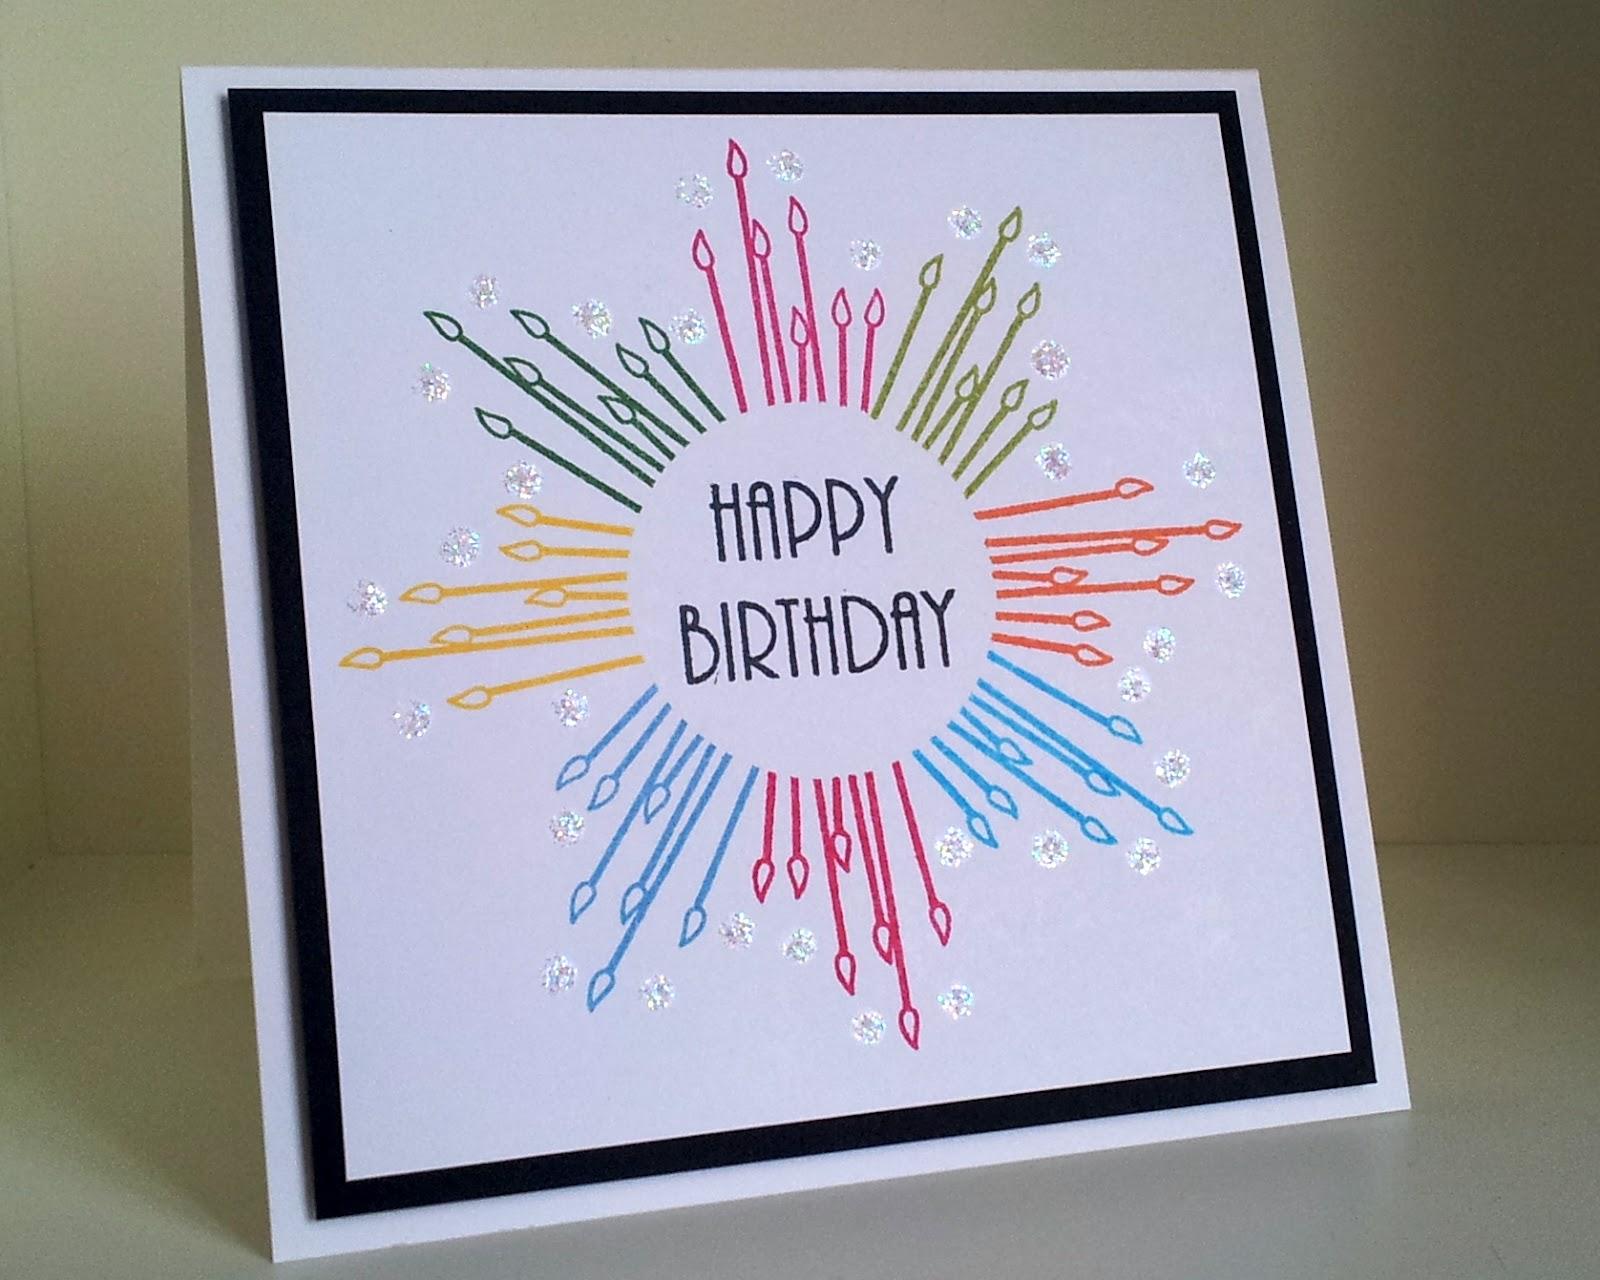 Party card designs pertamini party card designs maskerade outlawz cas week 2 happy birthday kristyandbryce Images